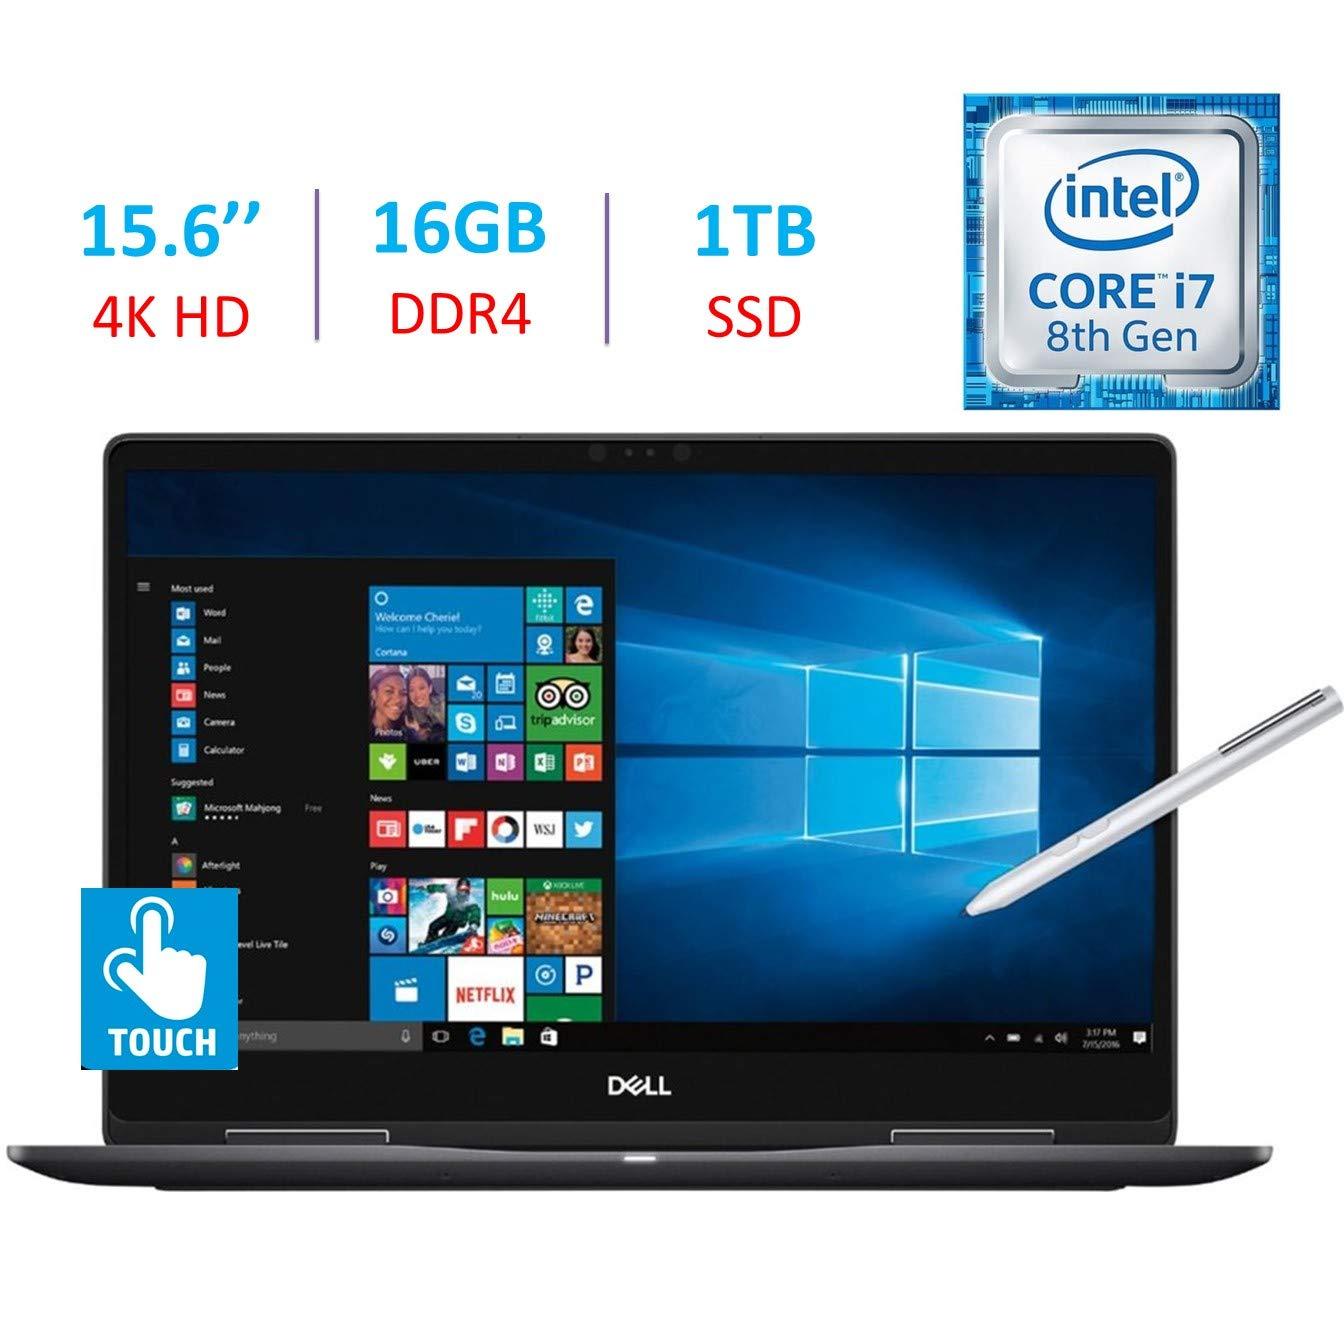 Dell 15.6-Inch 2-in-1 4K Ultra HD 3840 x 2160 Touch Laptop PC, Intel i7-8550U Processor, 16GB DDR4, 1TB SSD, NVIDIA GeForce MX130, Backlit Keyboard, Stylus Pen, Bluetooth, HDMI, Windows 10